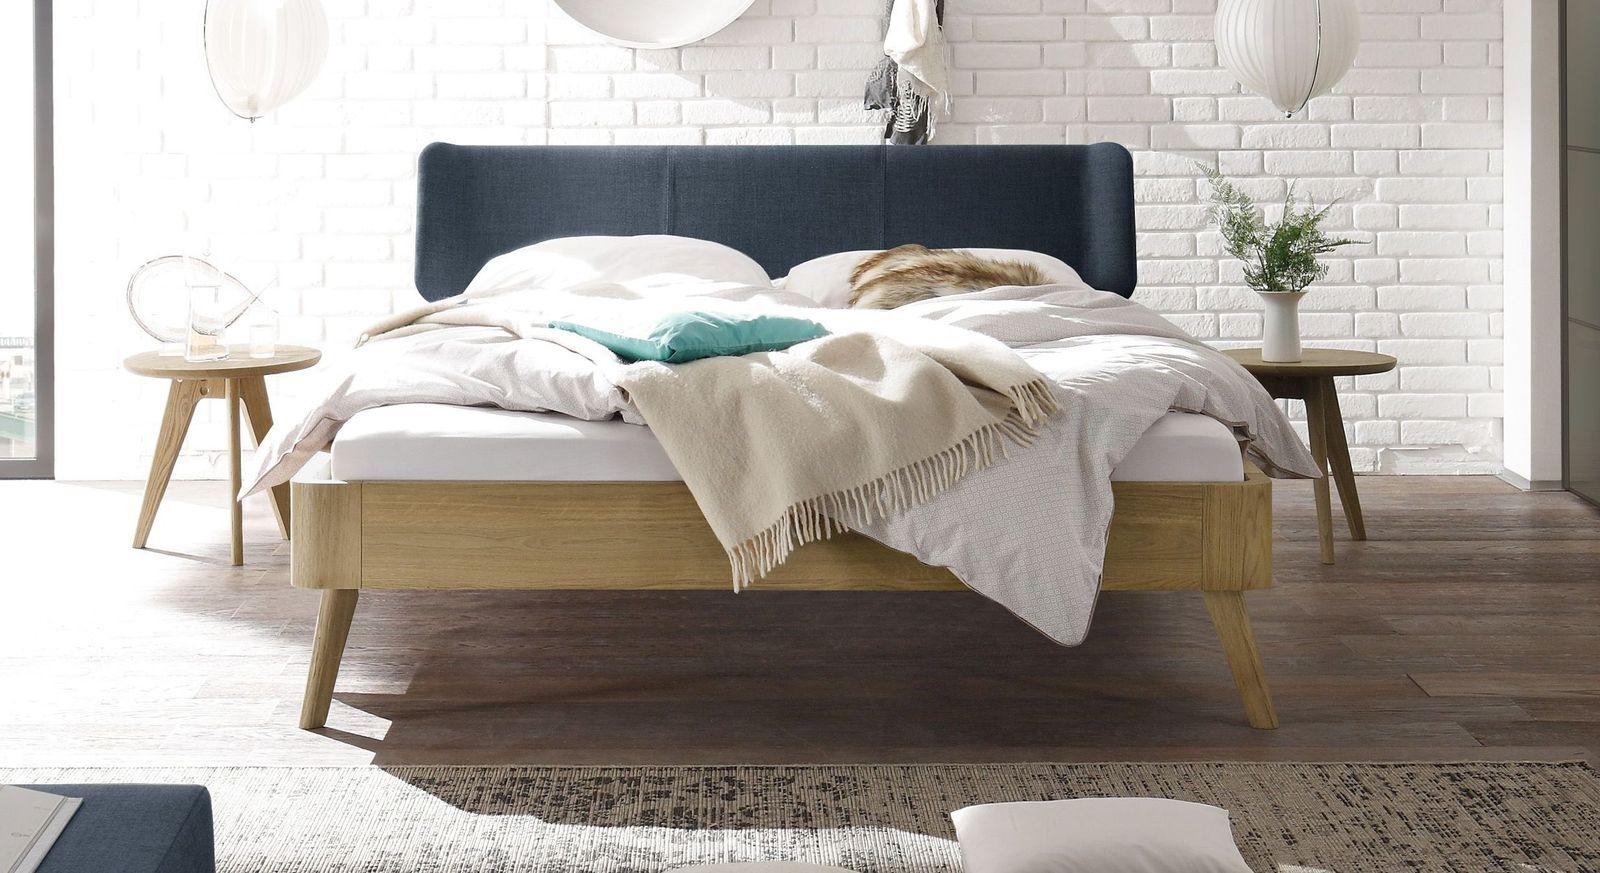 Bett Rakaia mit 25 cm Fußhöhe und marinefarbenem Kopfteil